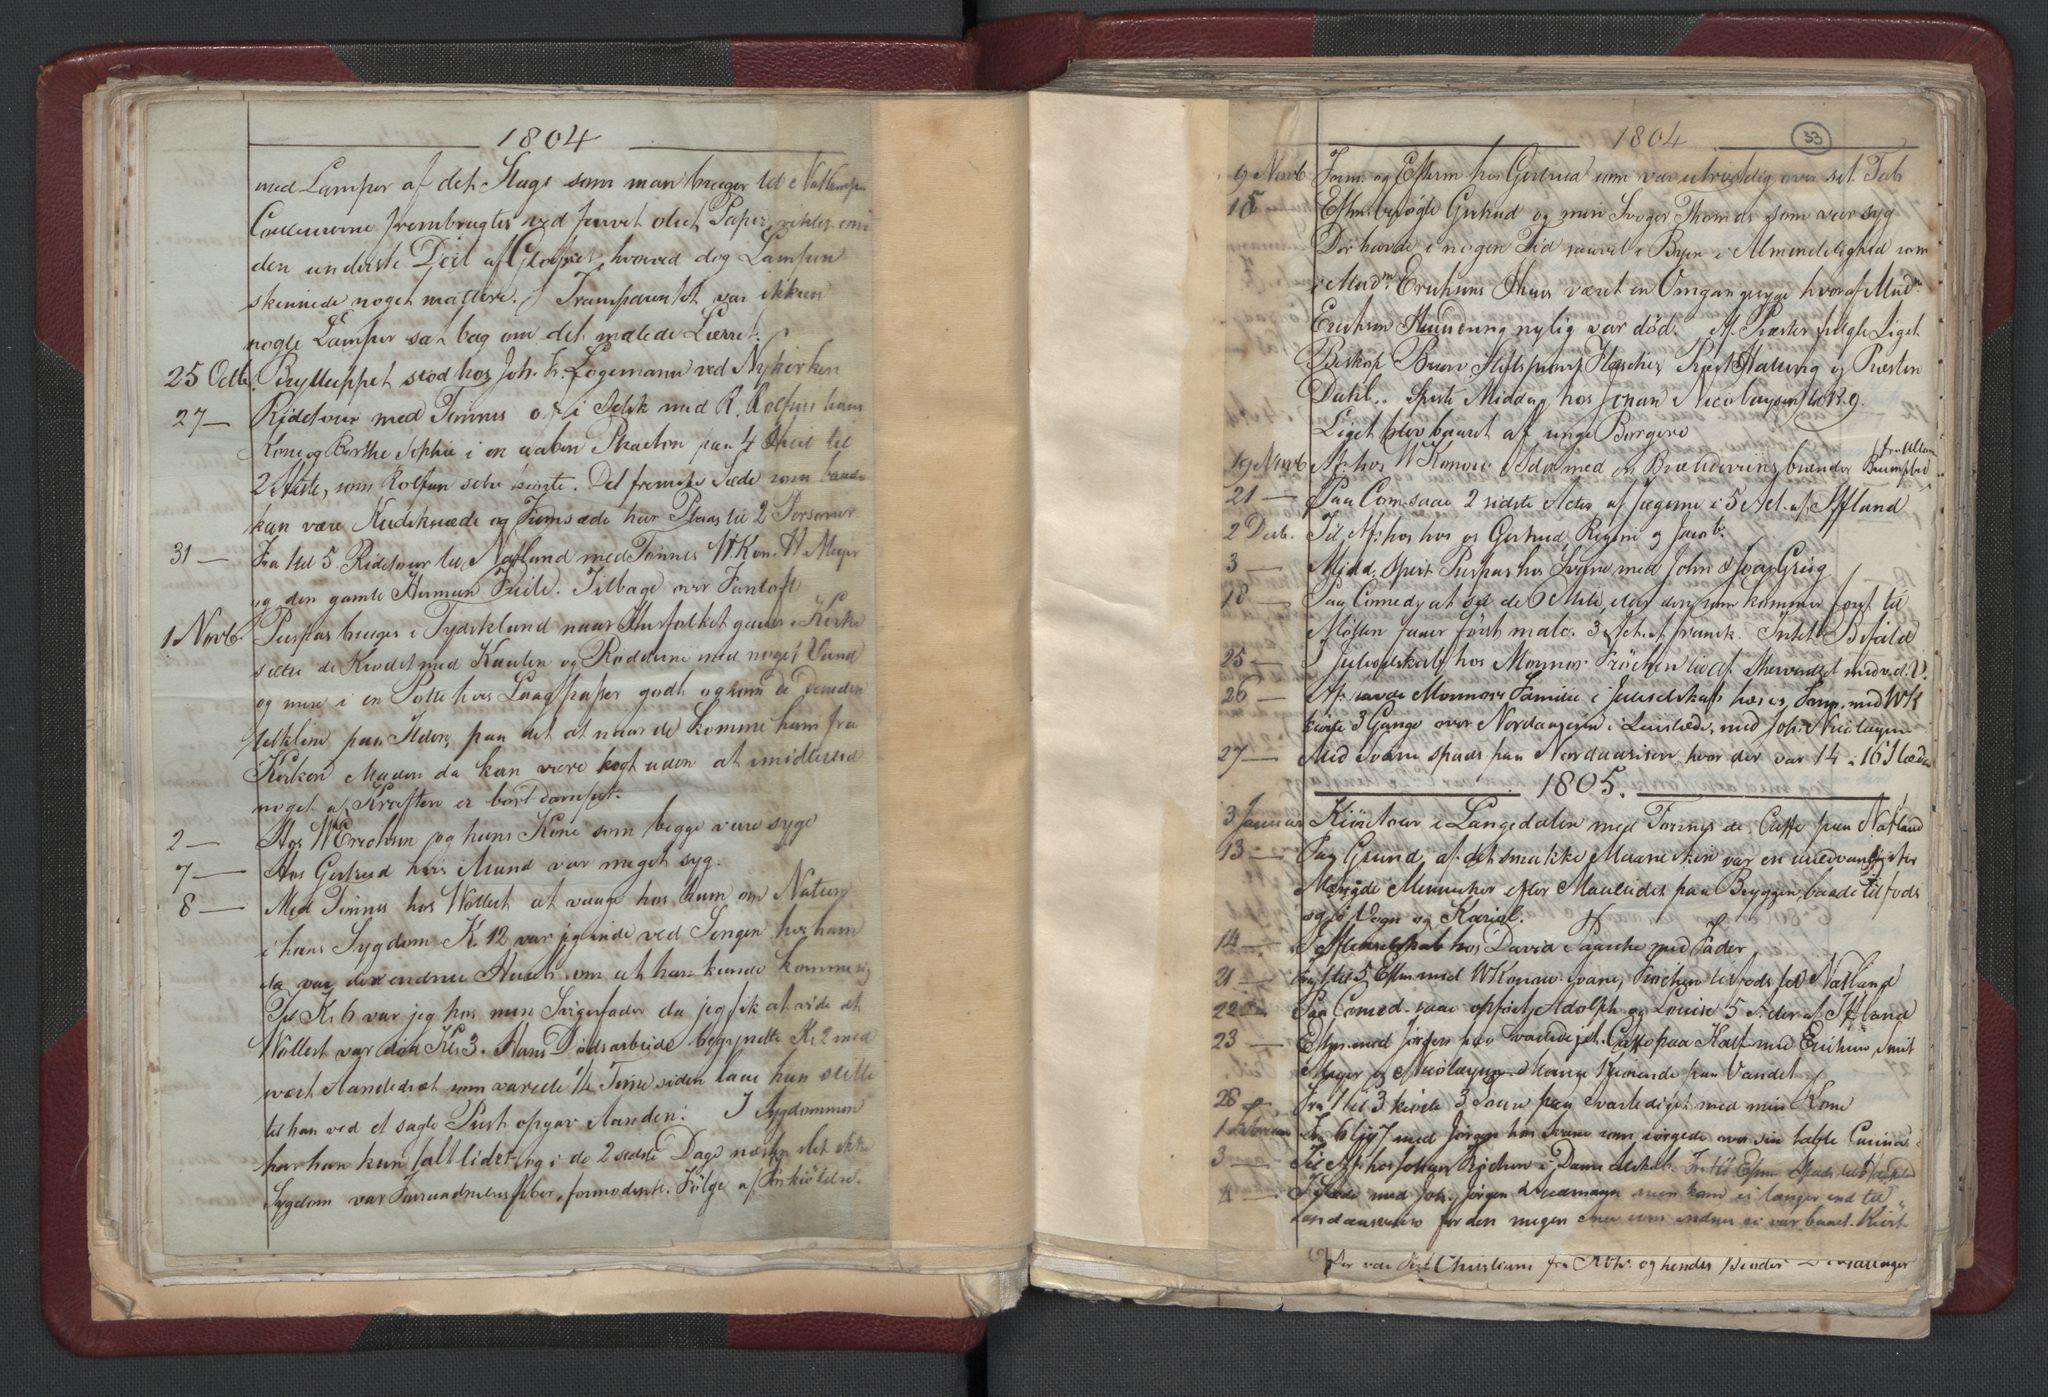 RA, Meltzer, Fredrik, F/L0001: Dagbok for årene 1796-1808, 1811, 1817, 1796-1817, s. 32b-33a